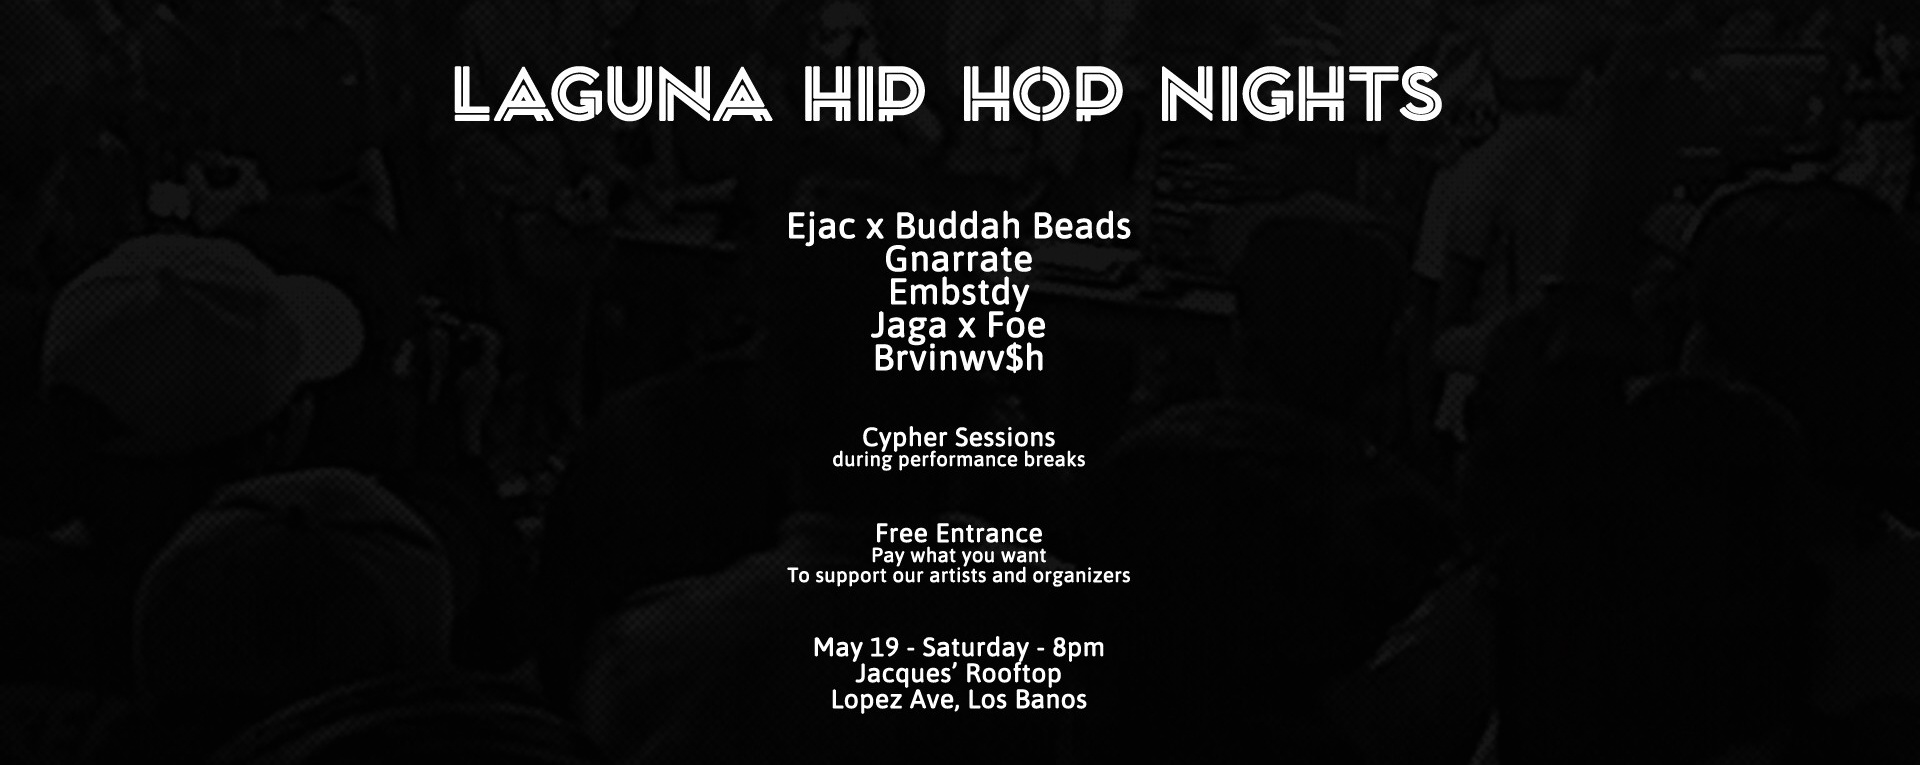 Laguna Hip Hop Nights